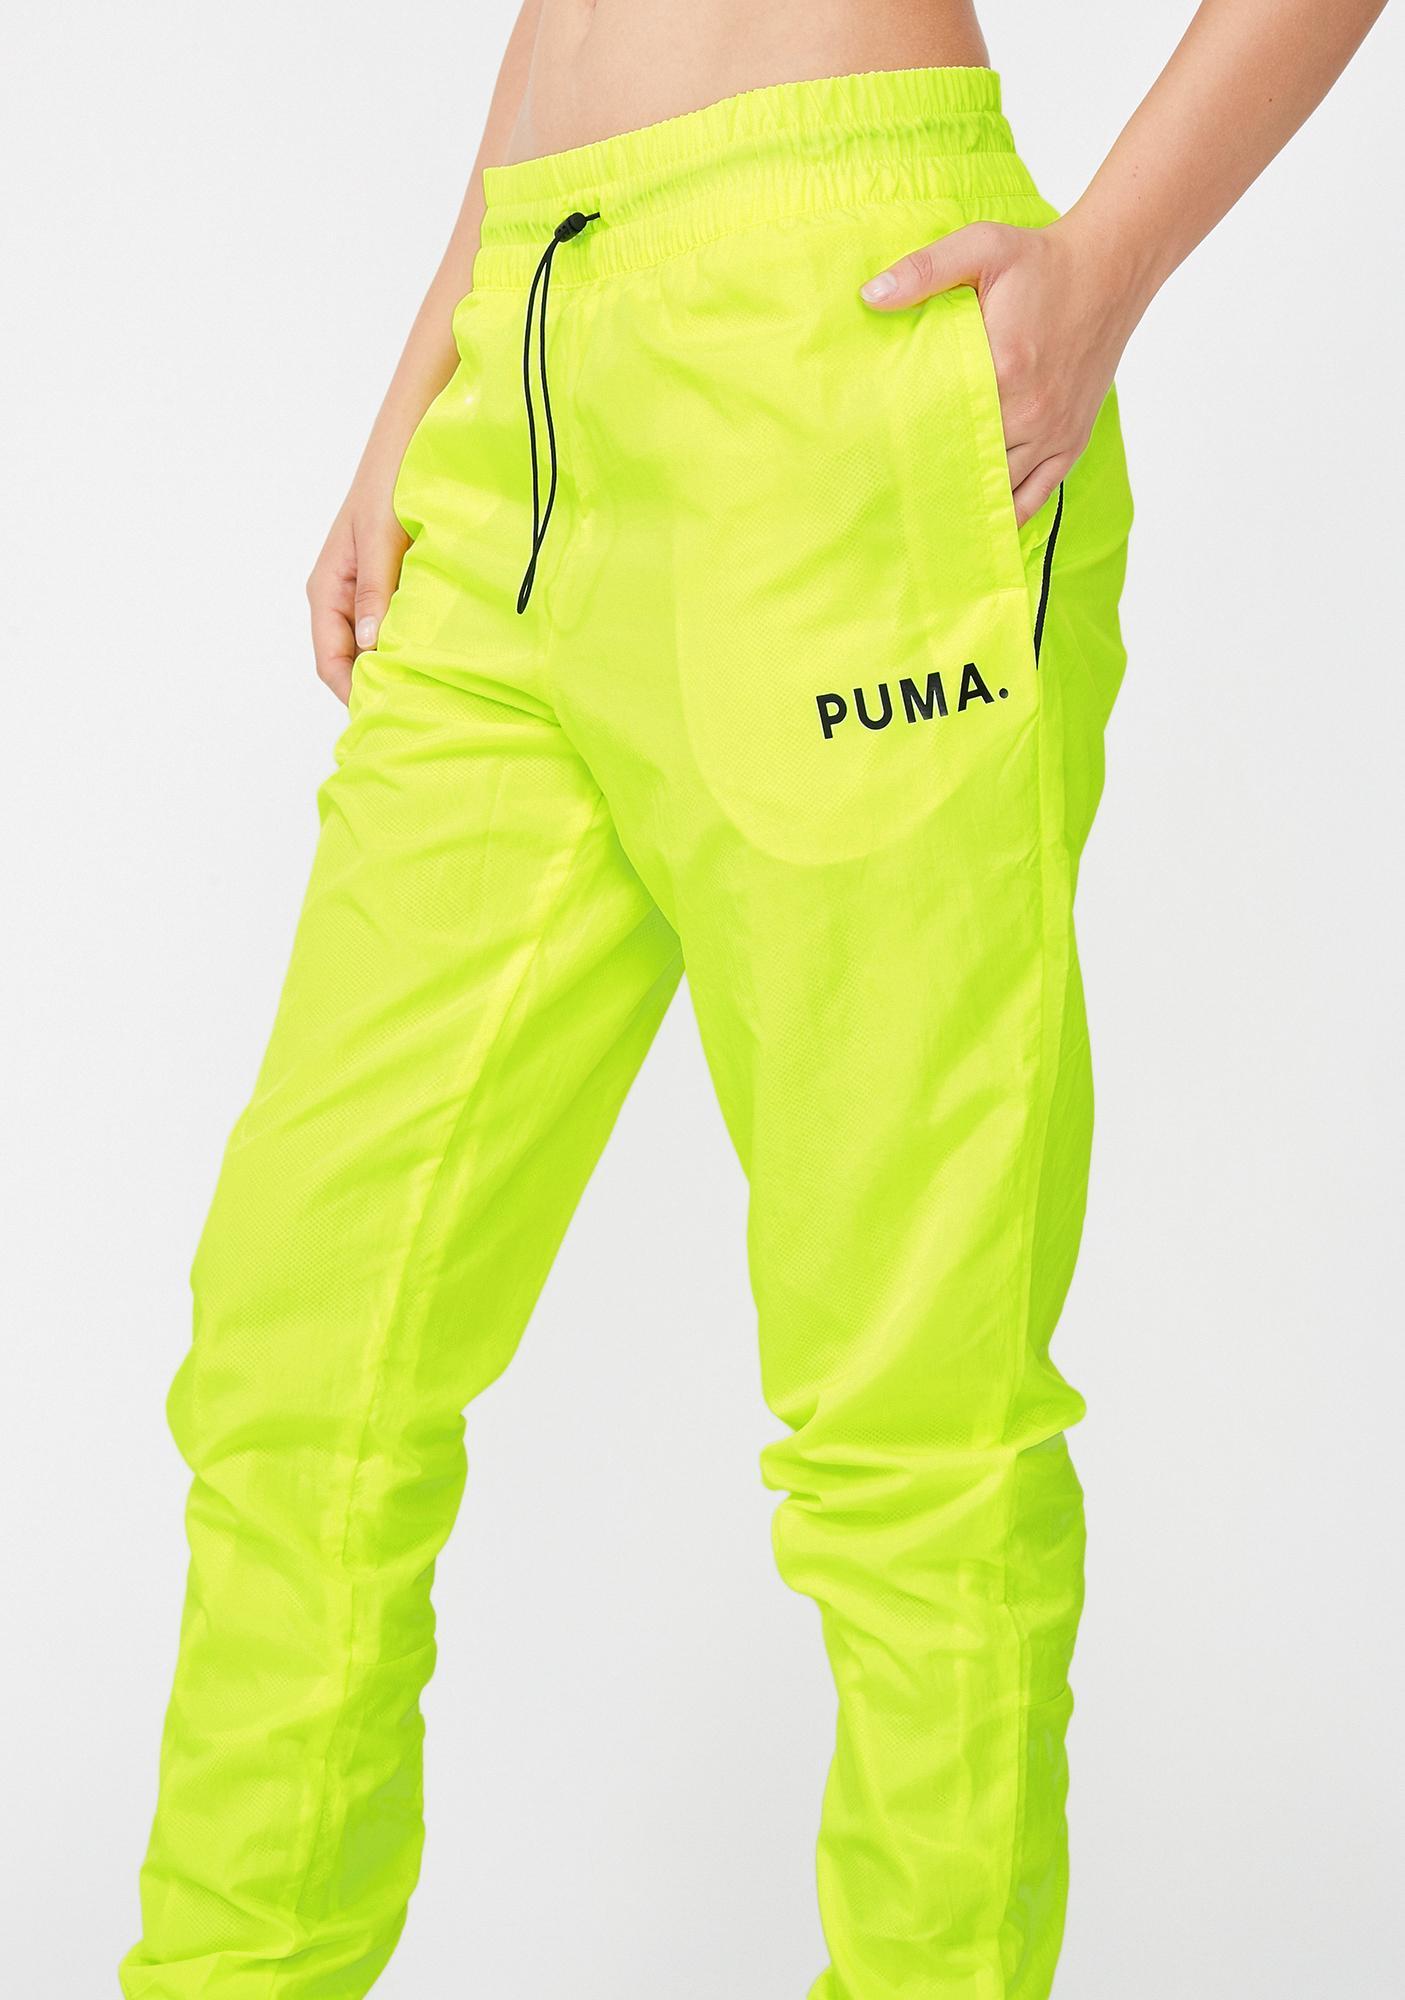 PUMA Chase Woven Pants